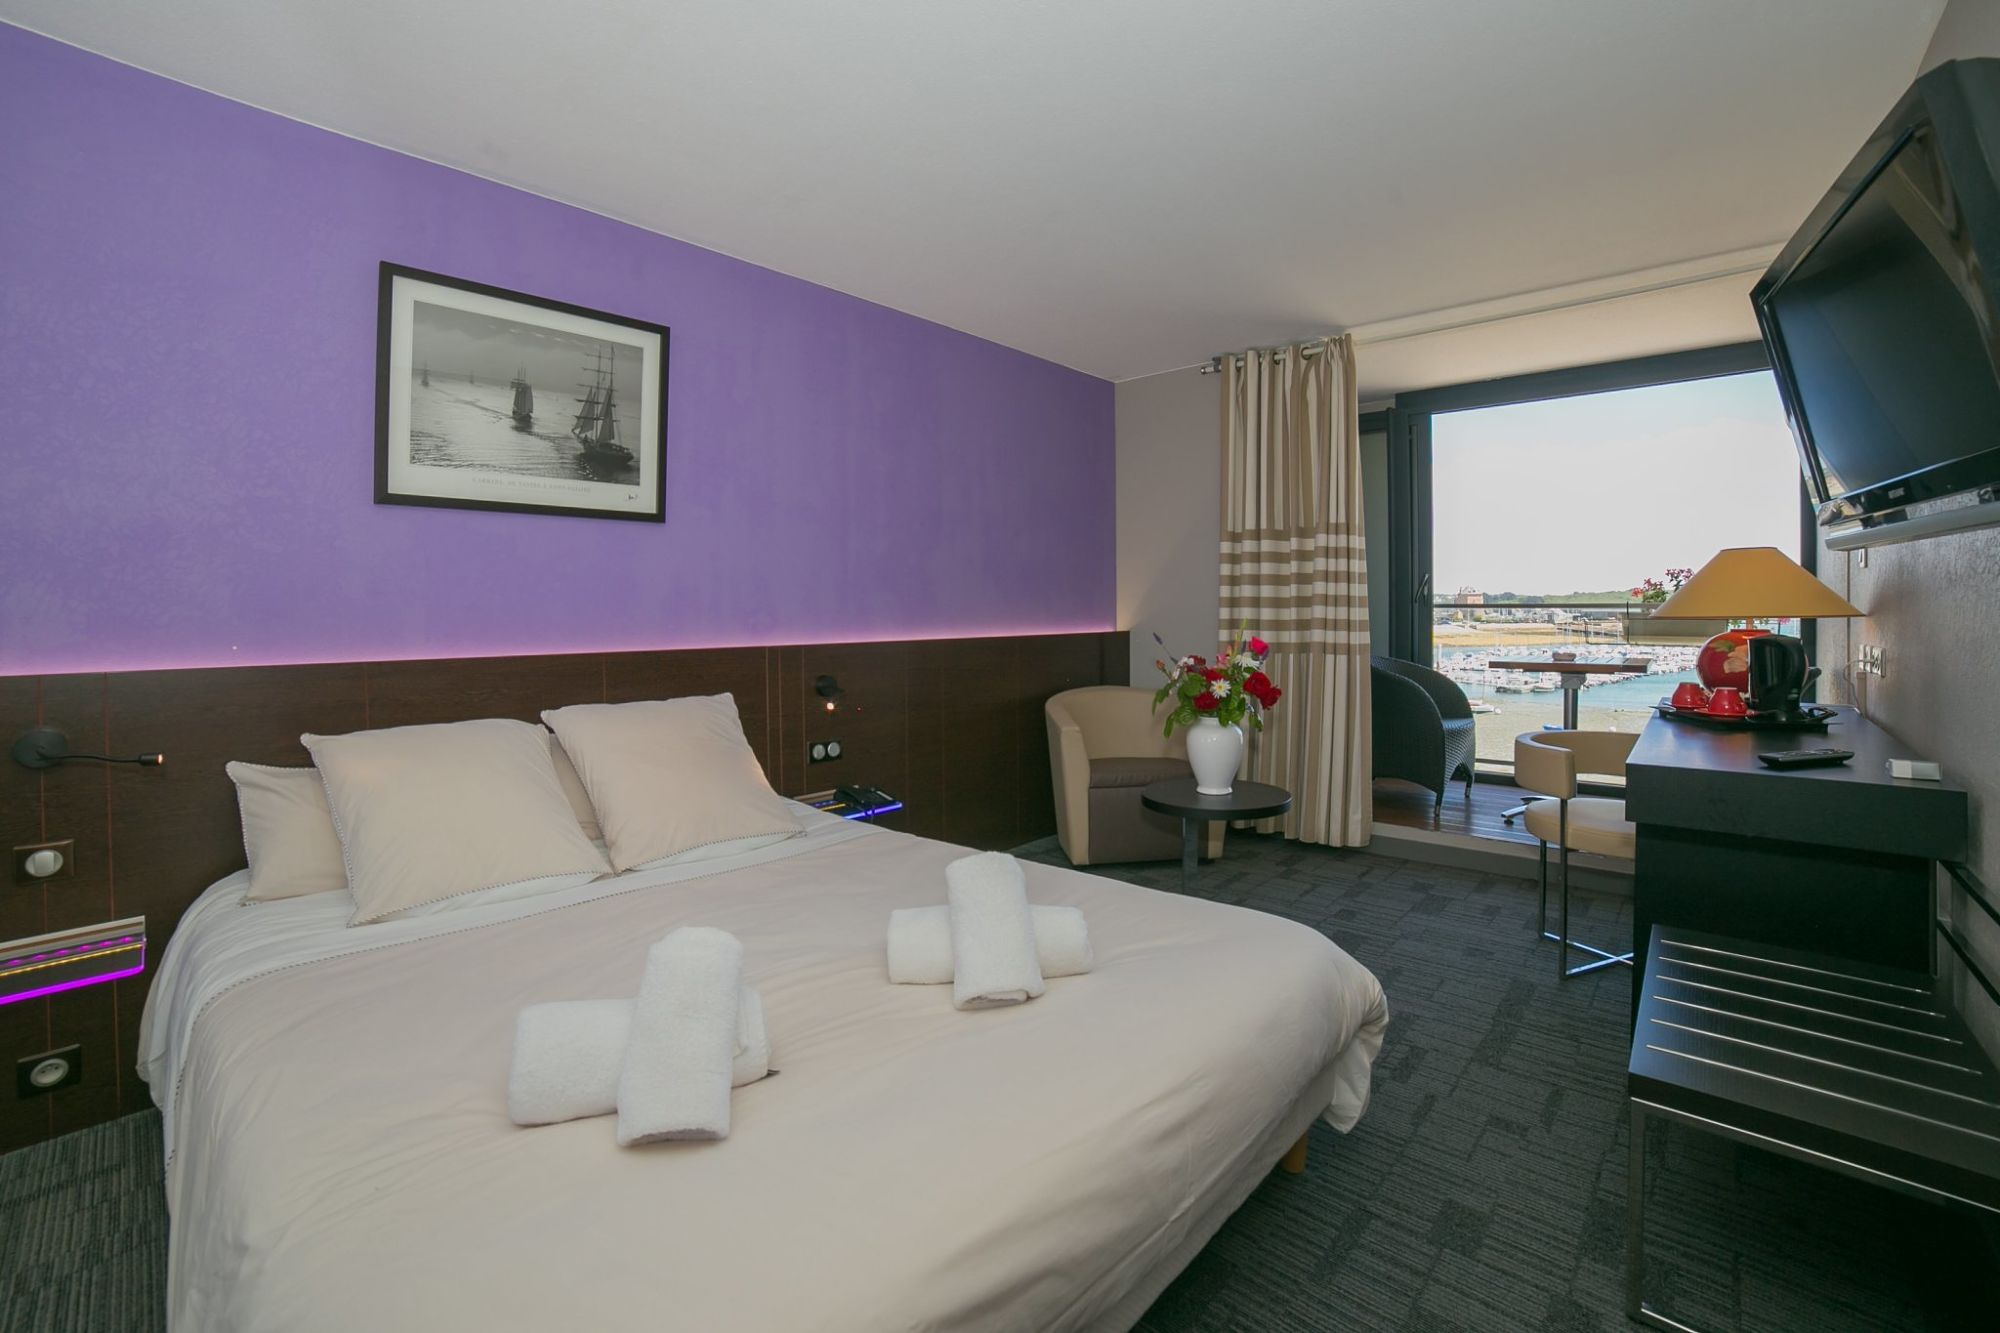 galerie-photos-hotel-spa-thalassa-camaret-chambres2